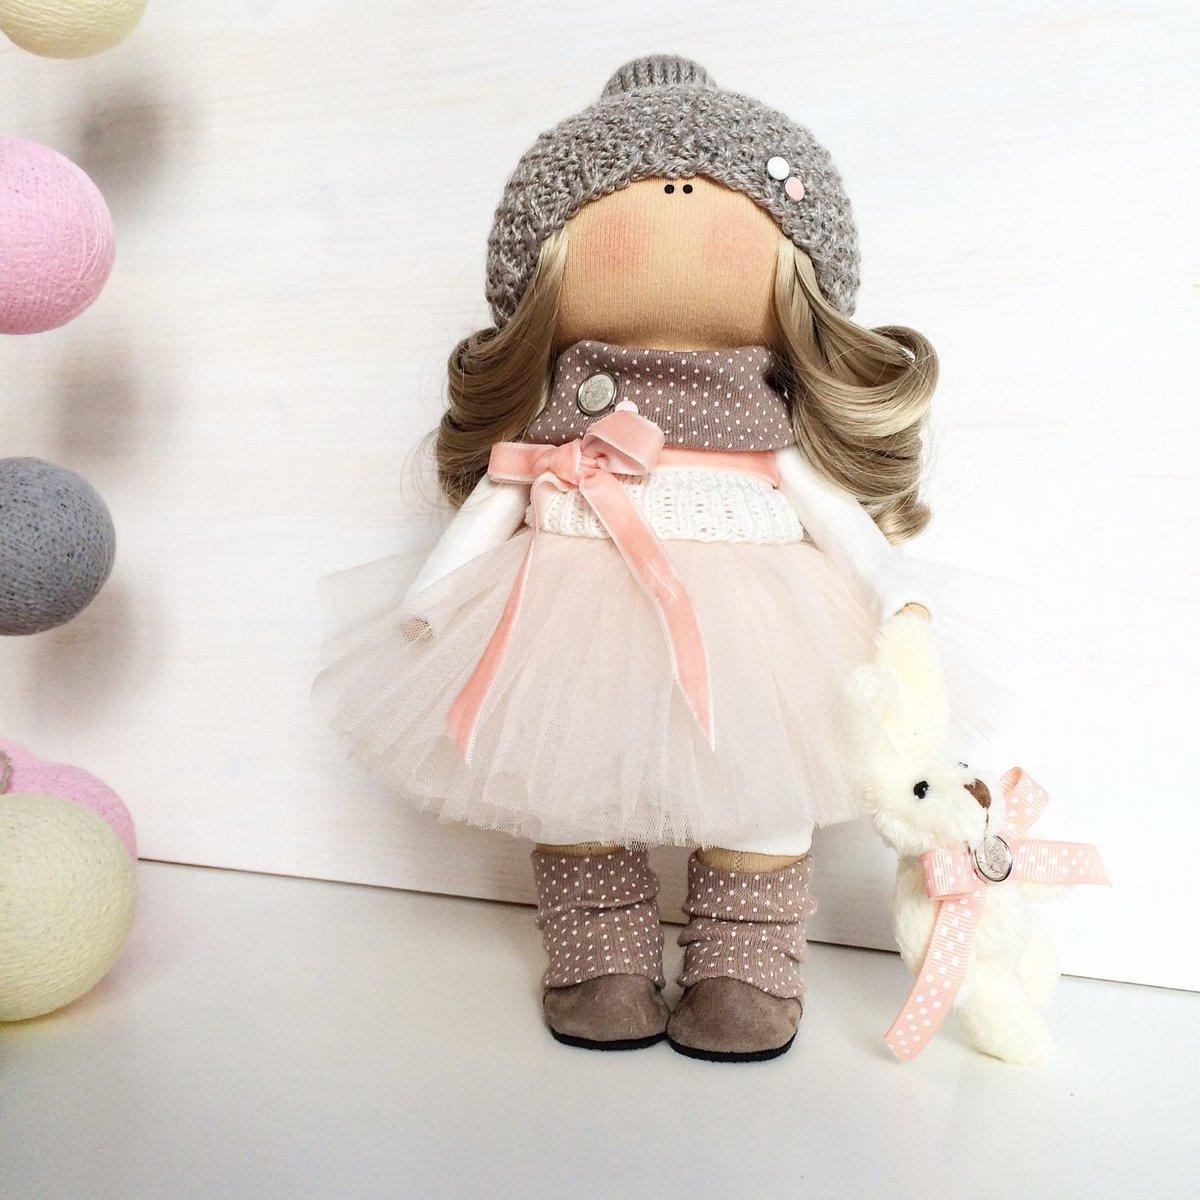 кукла долли своими руками мастер класс готовим, как уже